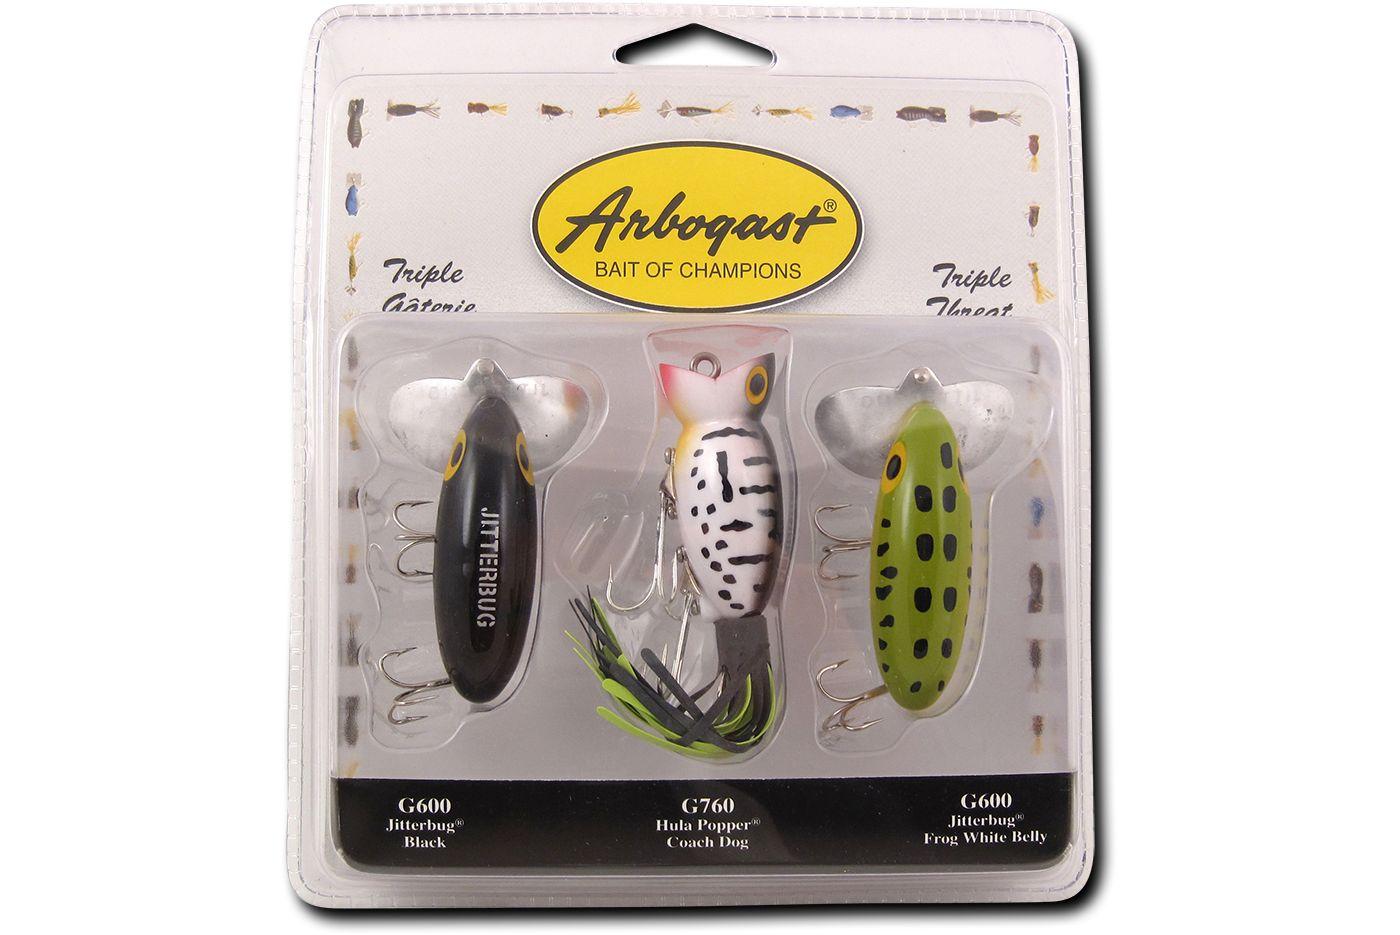 Arbogast Triple Threat Jitterbug/Hula Popper Kit